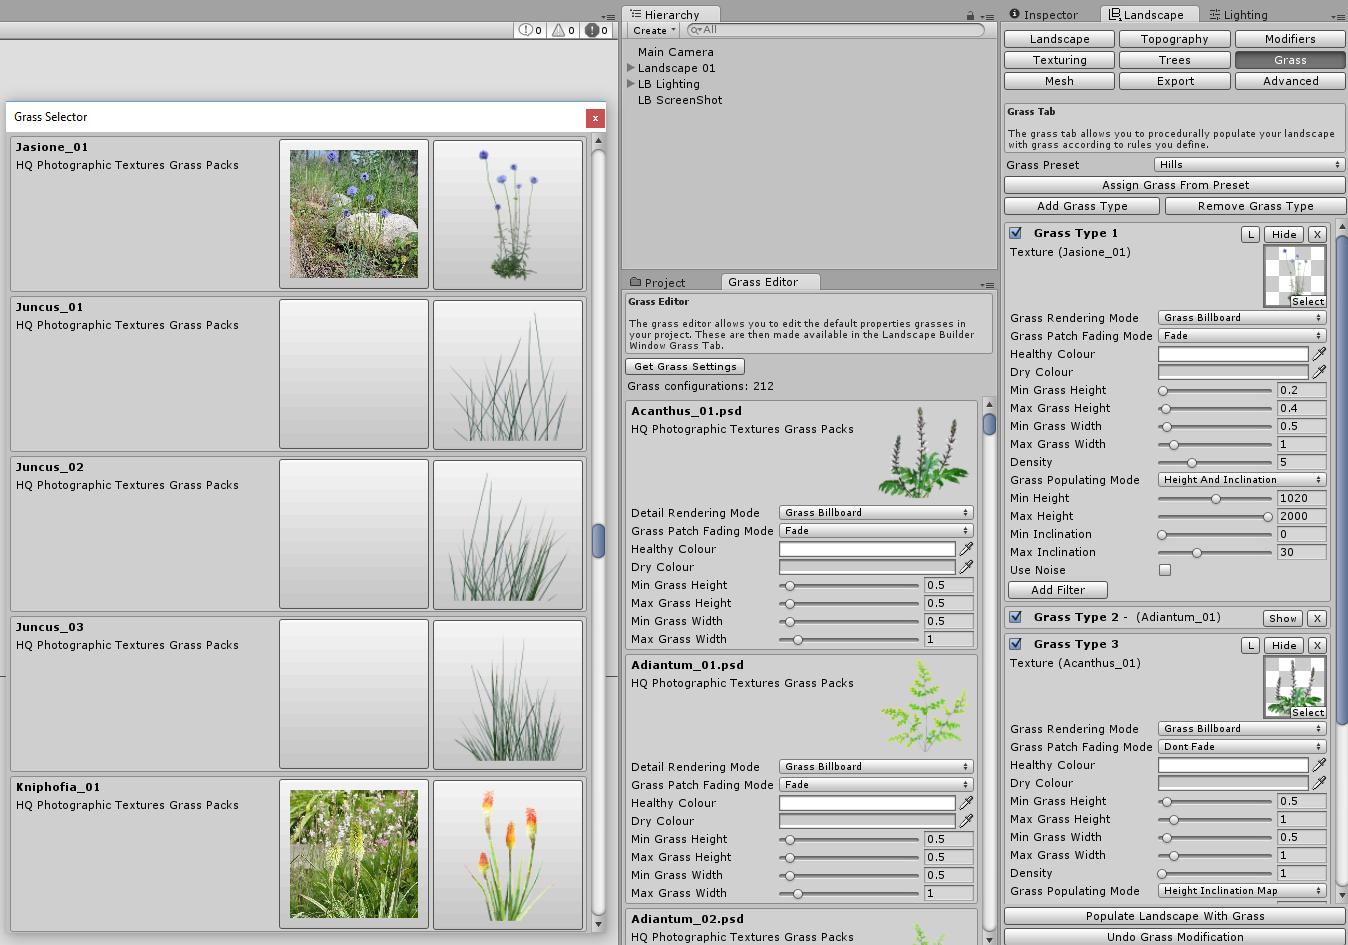 LandscapeBuilderGrassSelector.png